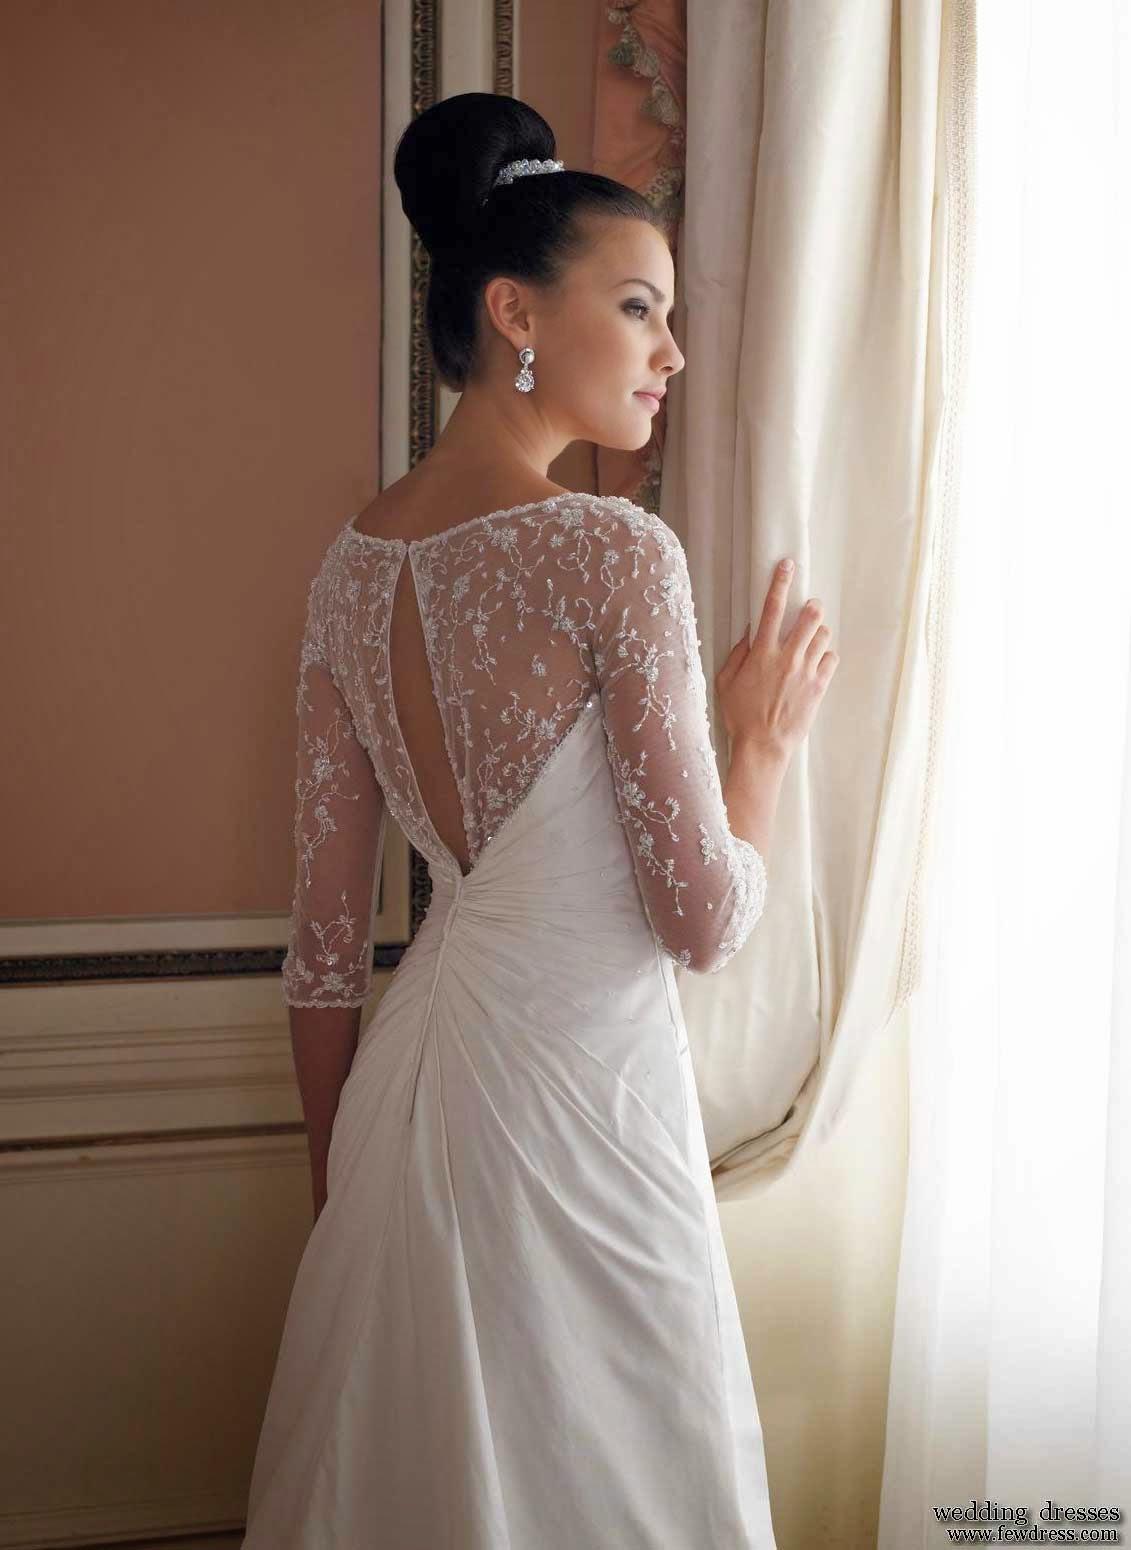 Casual summer wedding dresses ideas photos hd for Summer casual wedding dresses